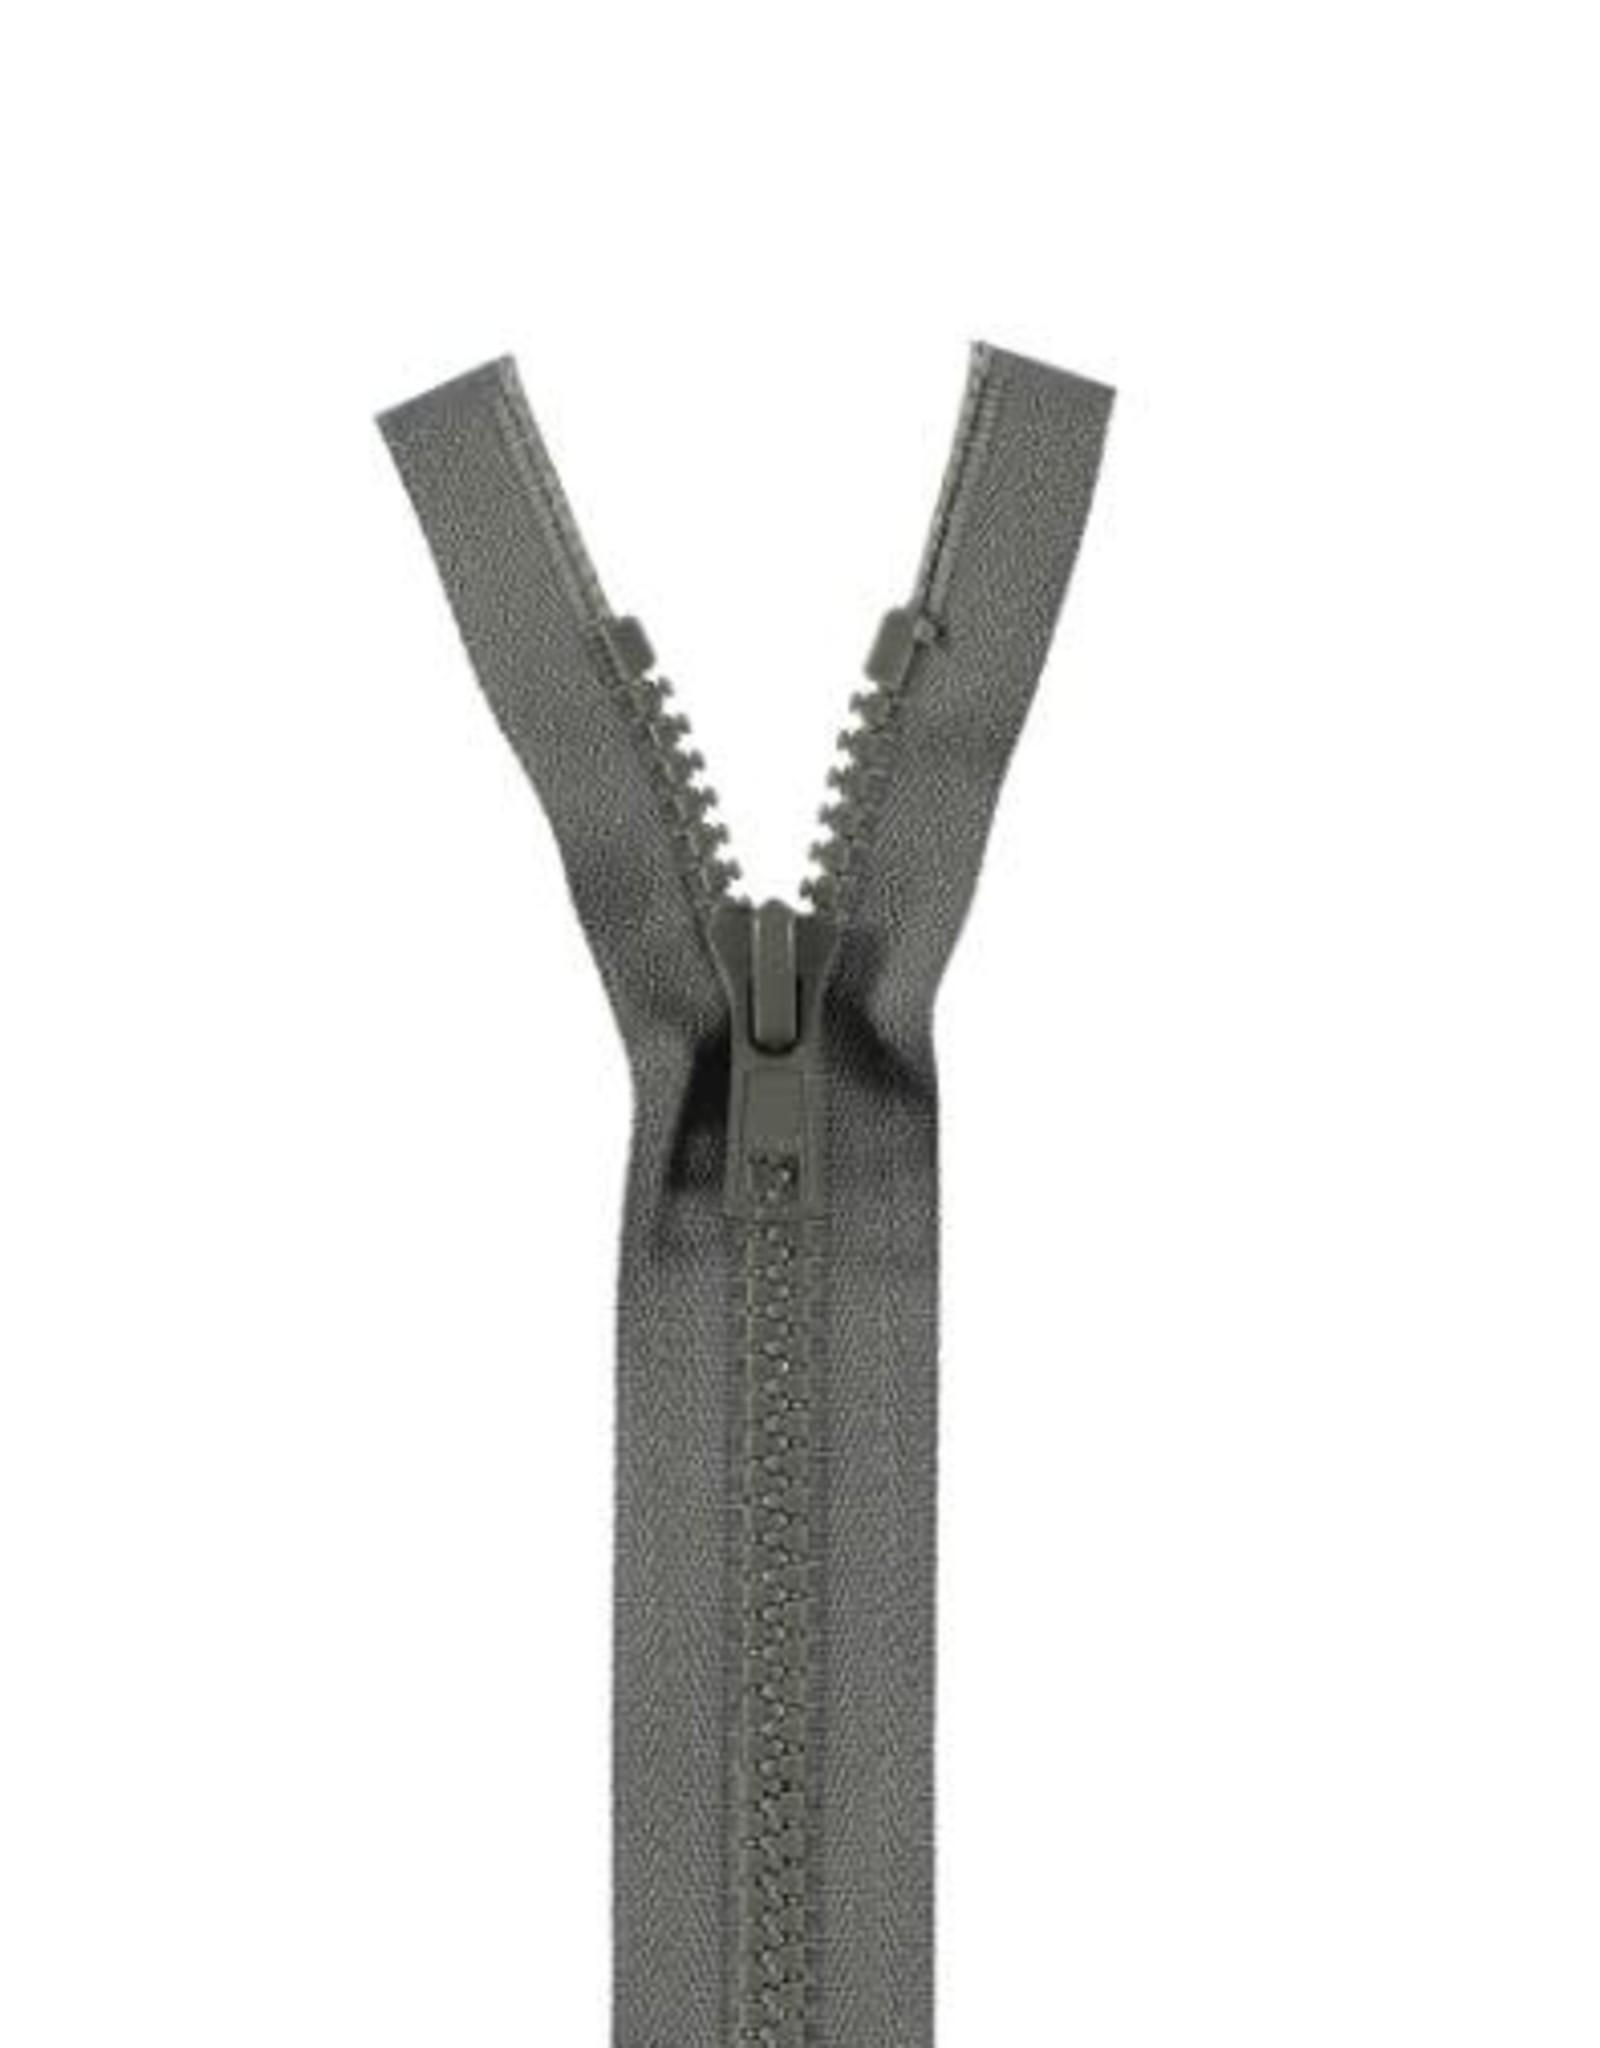 YKK BLOKRITS 5 DEELBAAR grijs 578-75cm